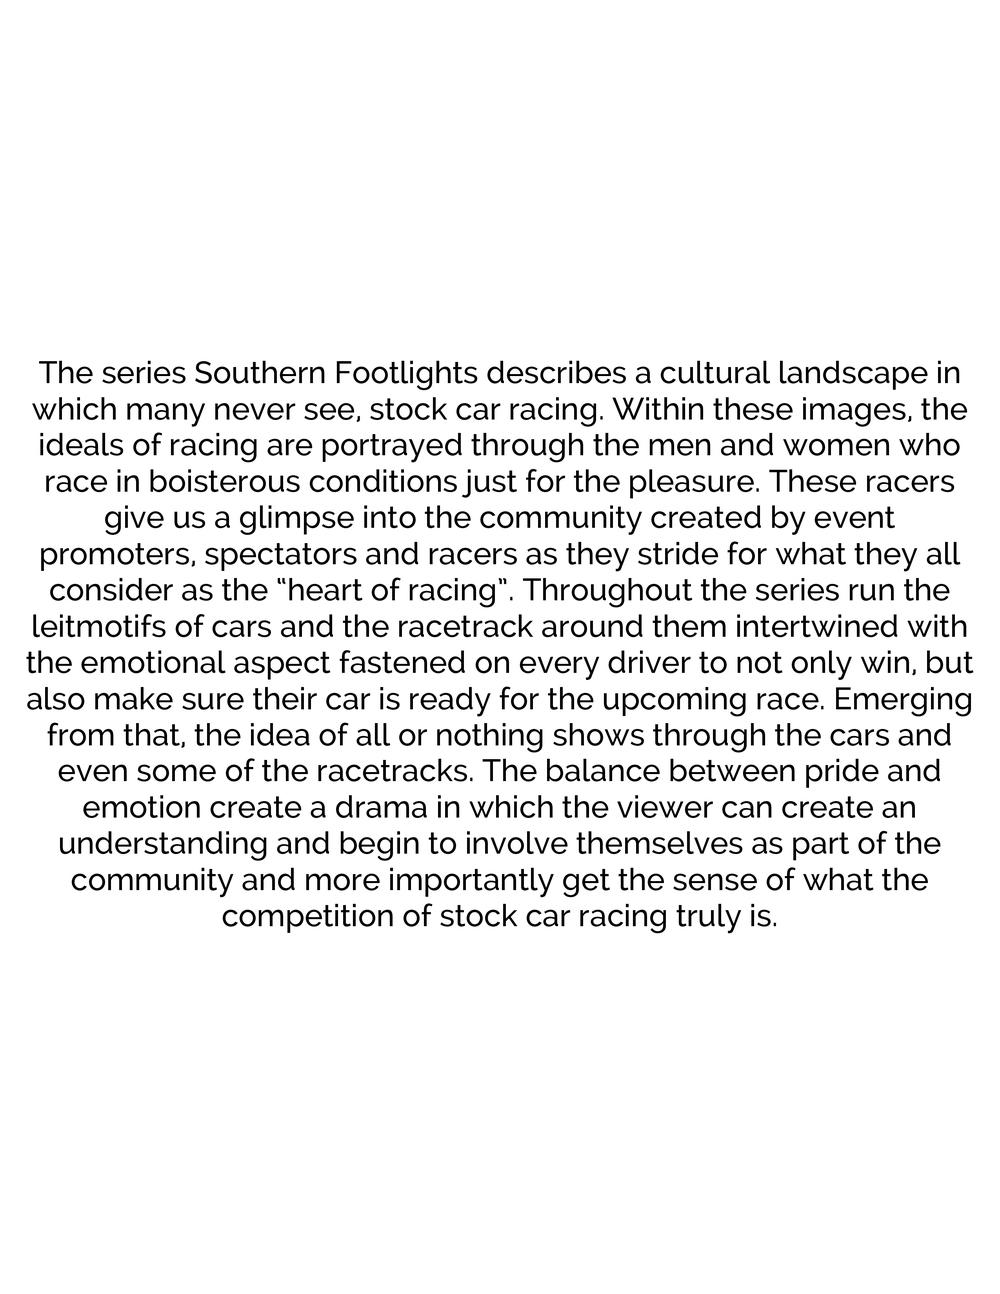 SouthernFootlights-ArtistStatement.jpg